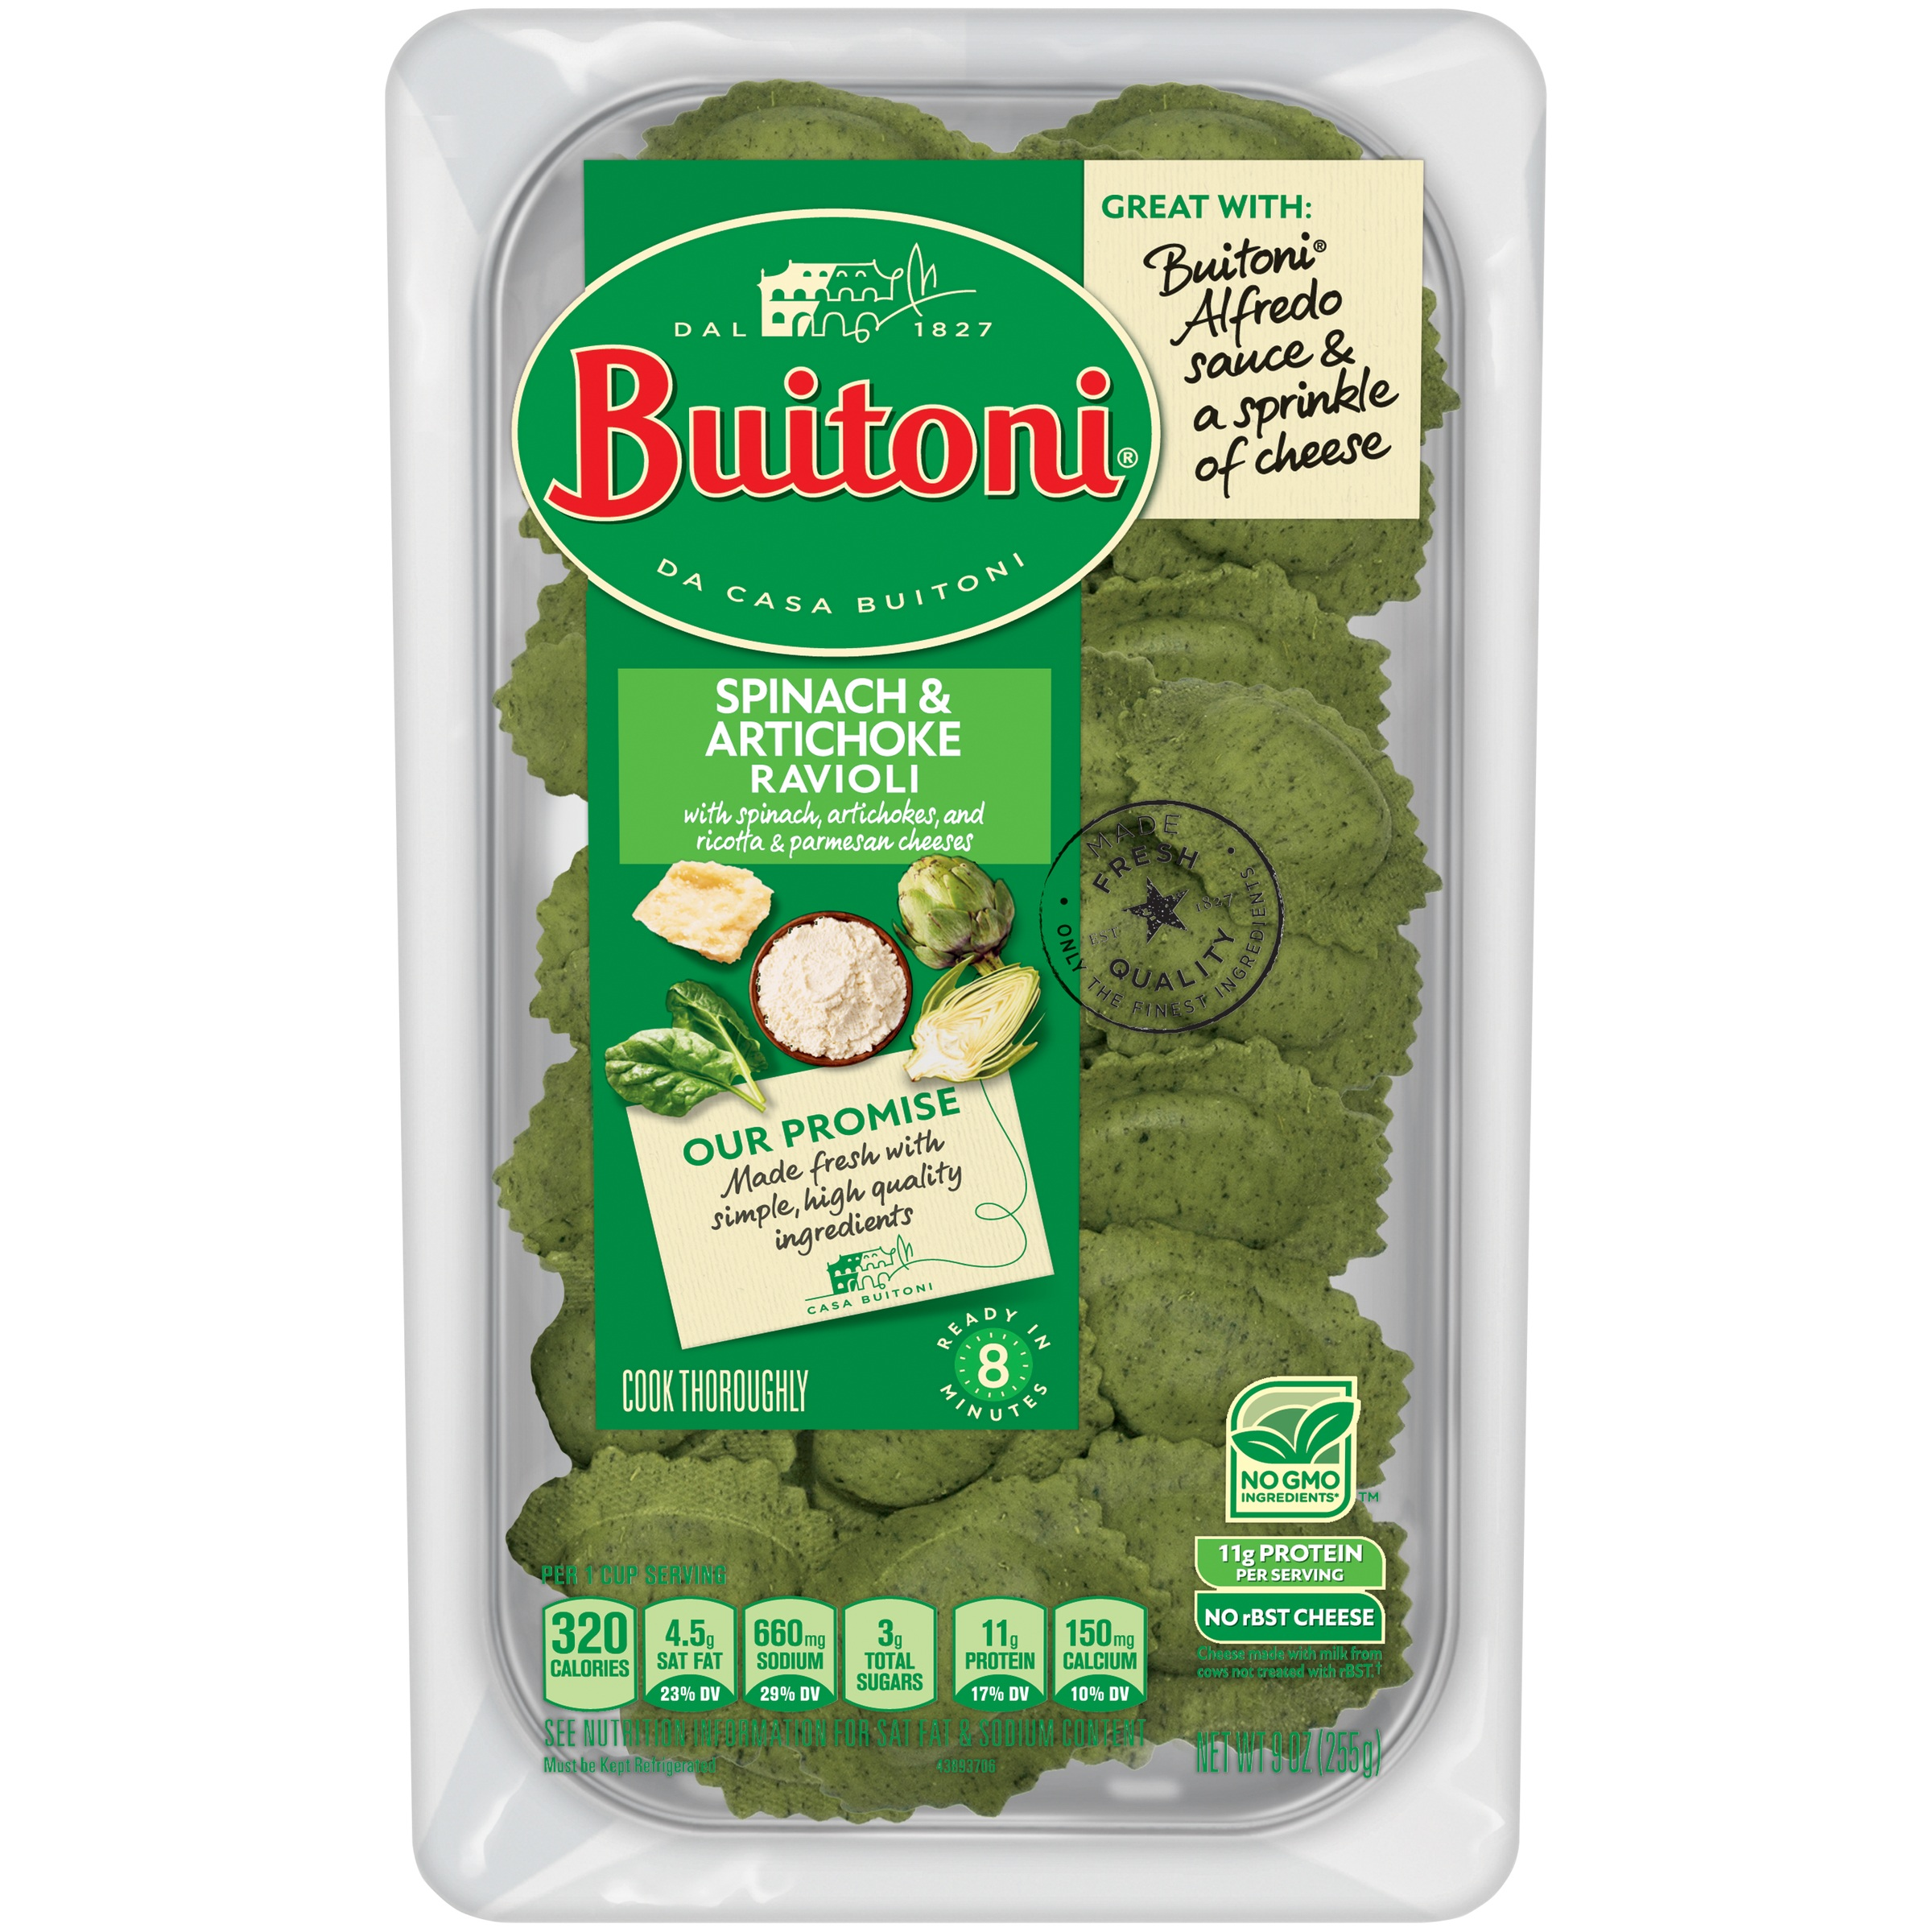 BUITONI Spinach & Artichoke Ravioli Refrigerated Pasta 9 oz. Pack